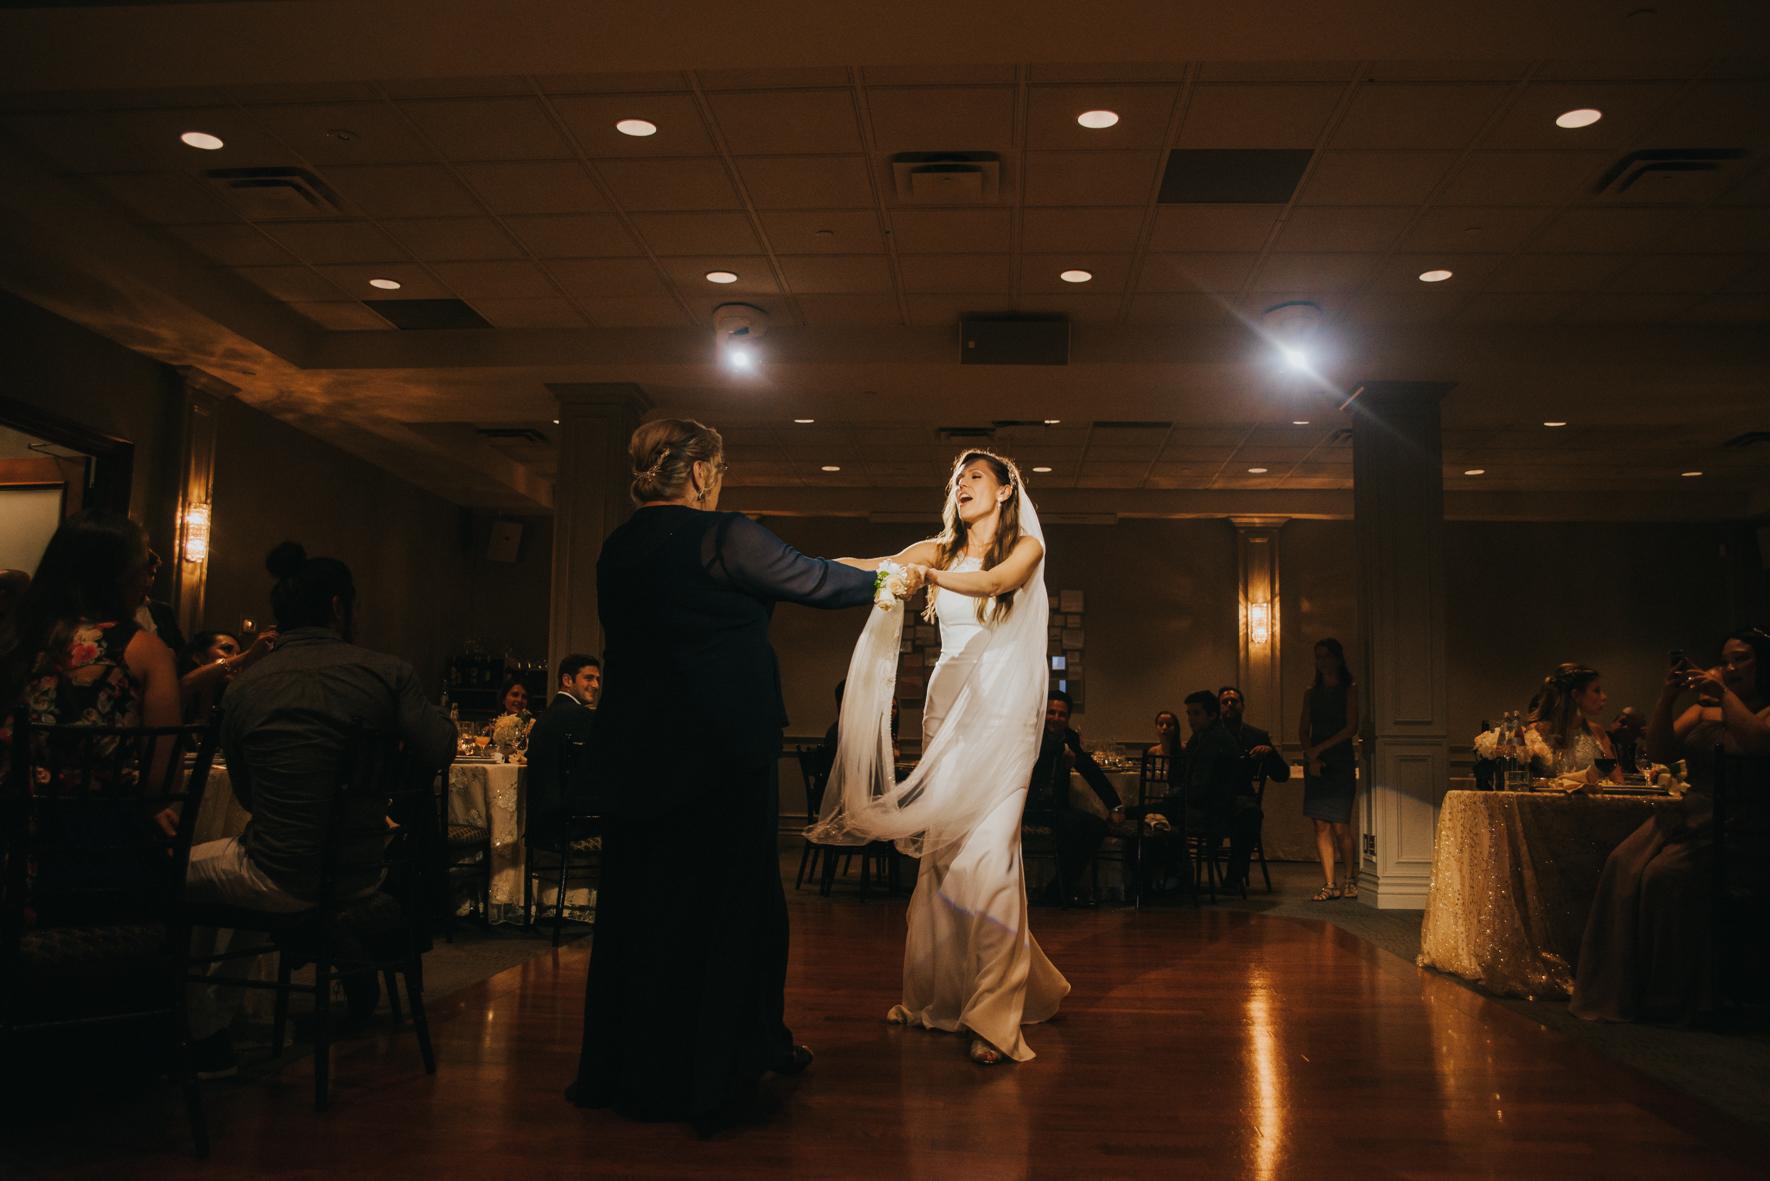 sandy-jana-copper-creek-golf-club-slovak-wedding-toronto-scandaleuse-photography-weddings-36.jpg